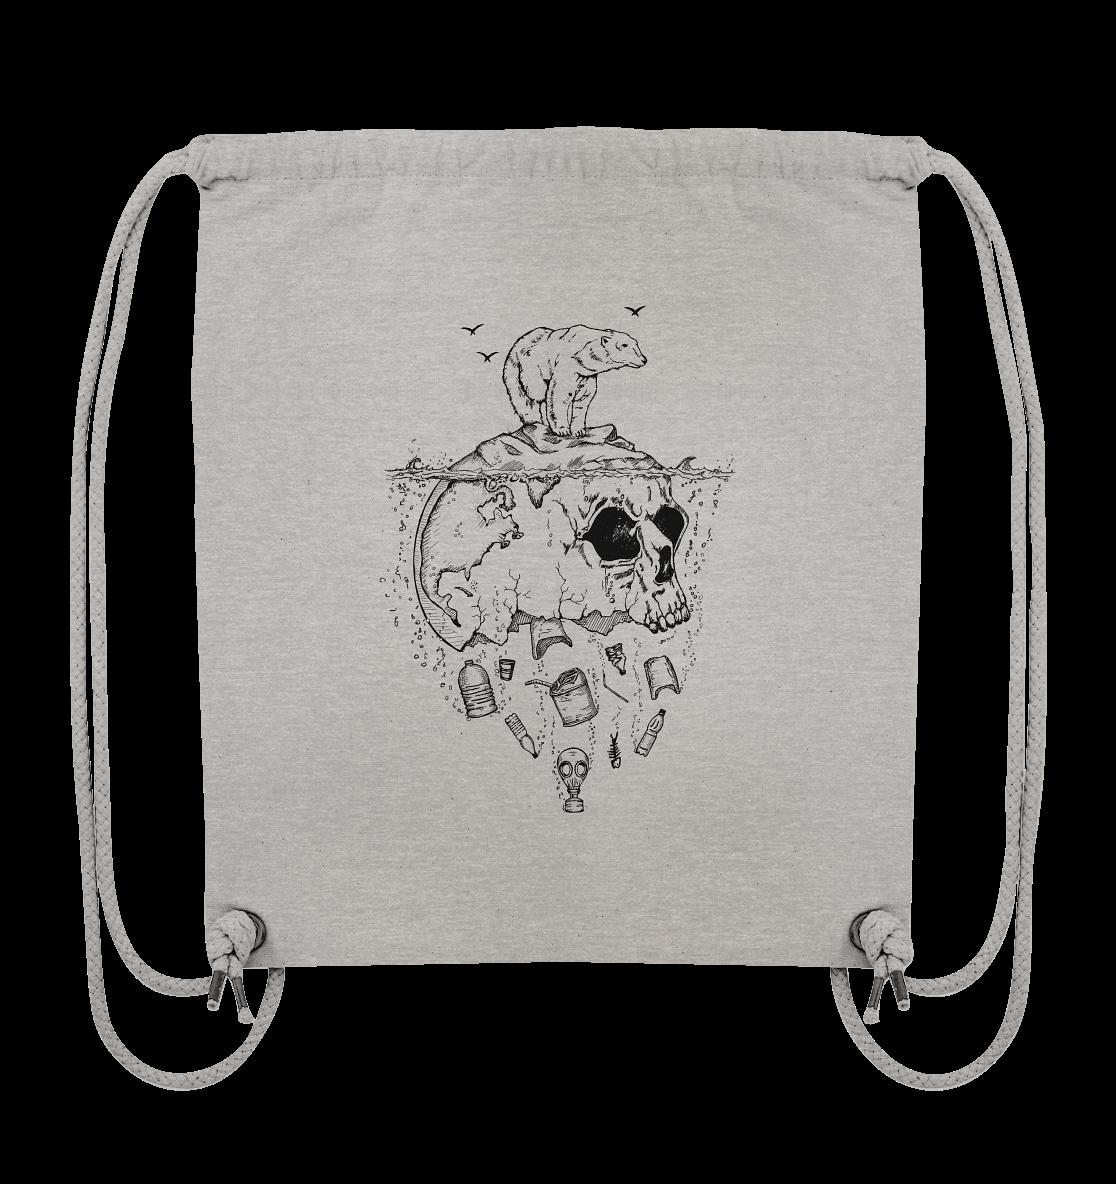 front-organic-gym-bag-c2c1c0-1116x-1.png